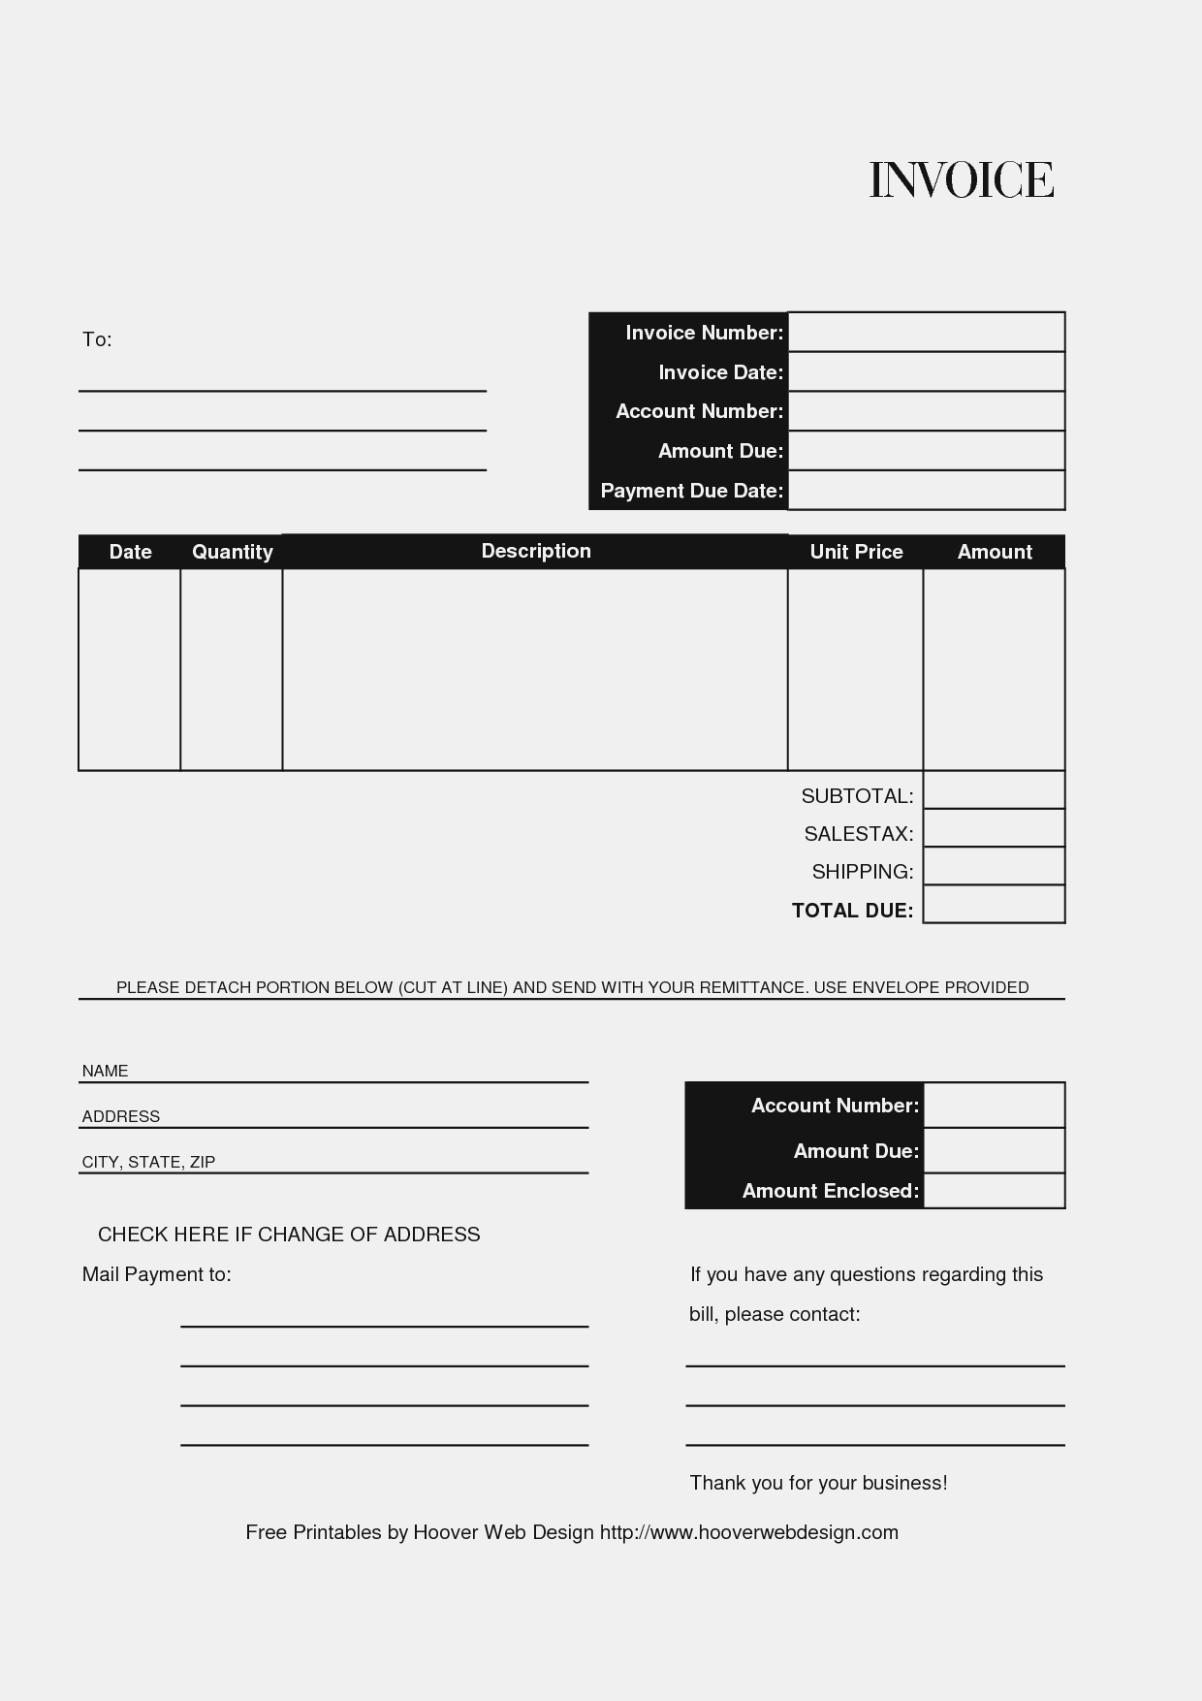 Free Editable And Printable Billing Invoice Template Sample With And Billing Invoice Sample